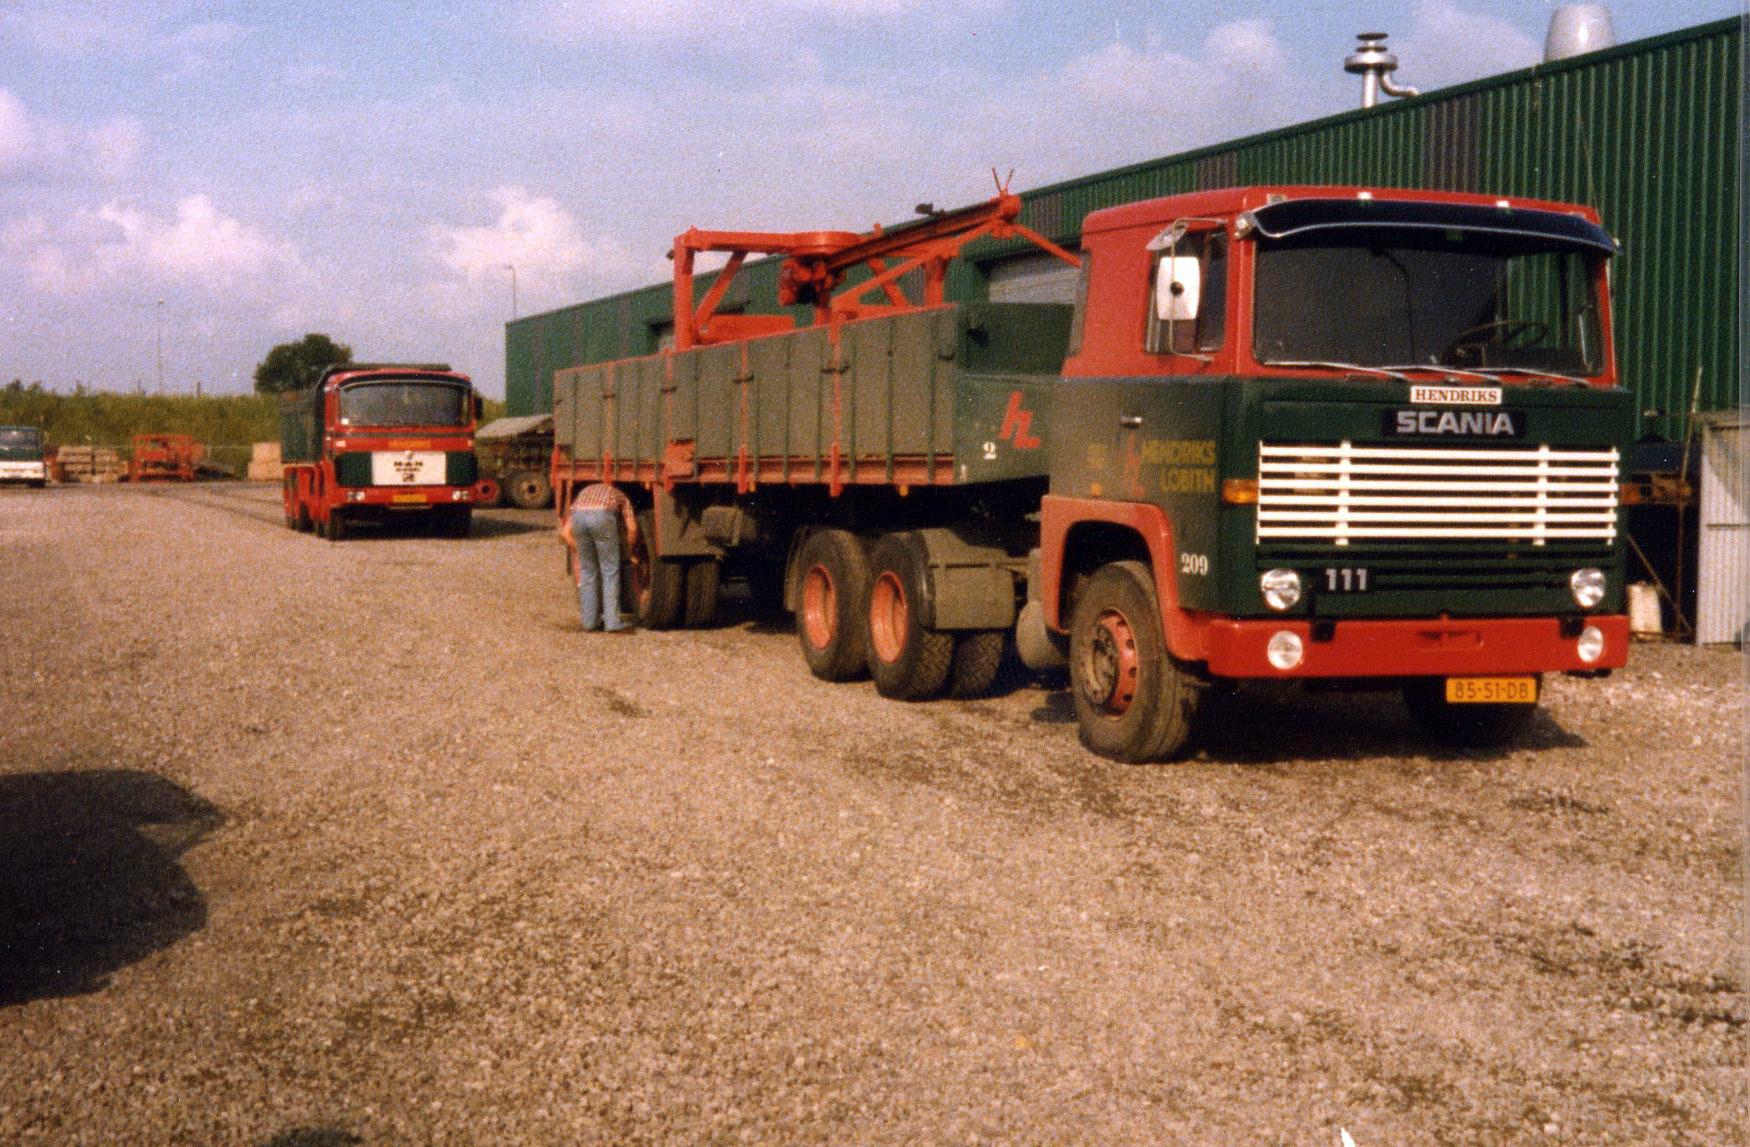 Hendriks-Lobith-Scania-LB111-8551DB